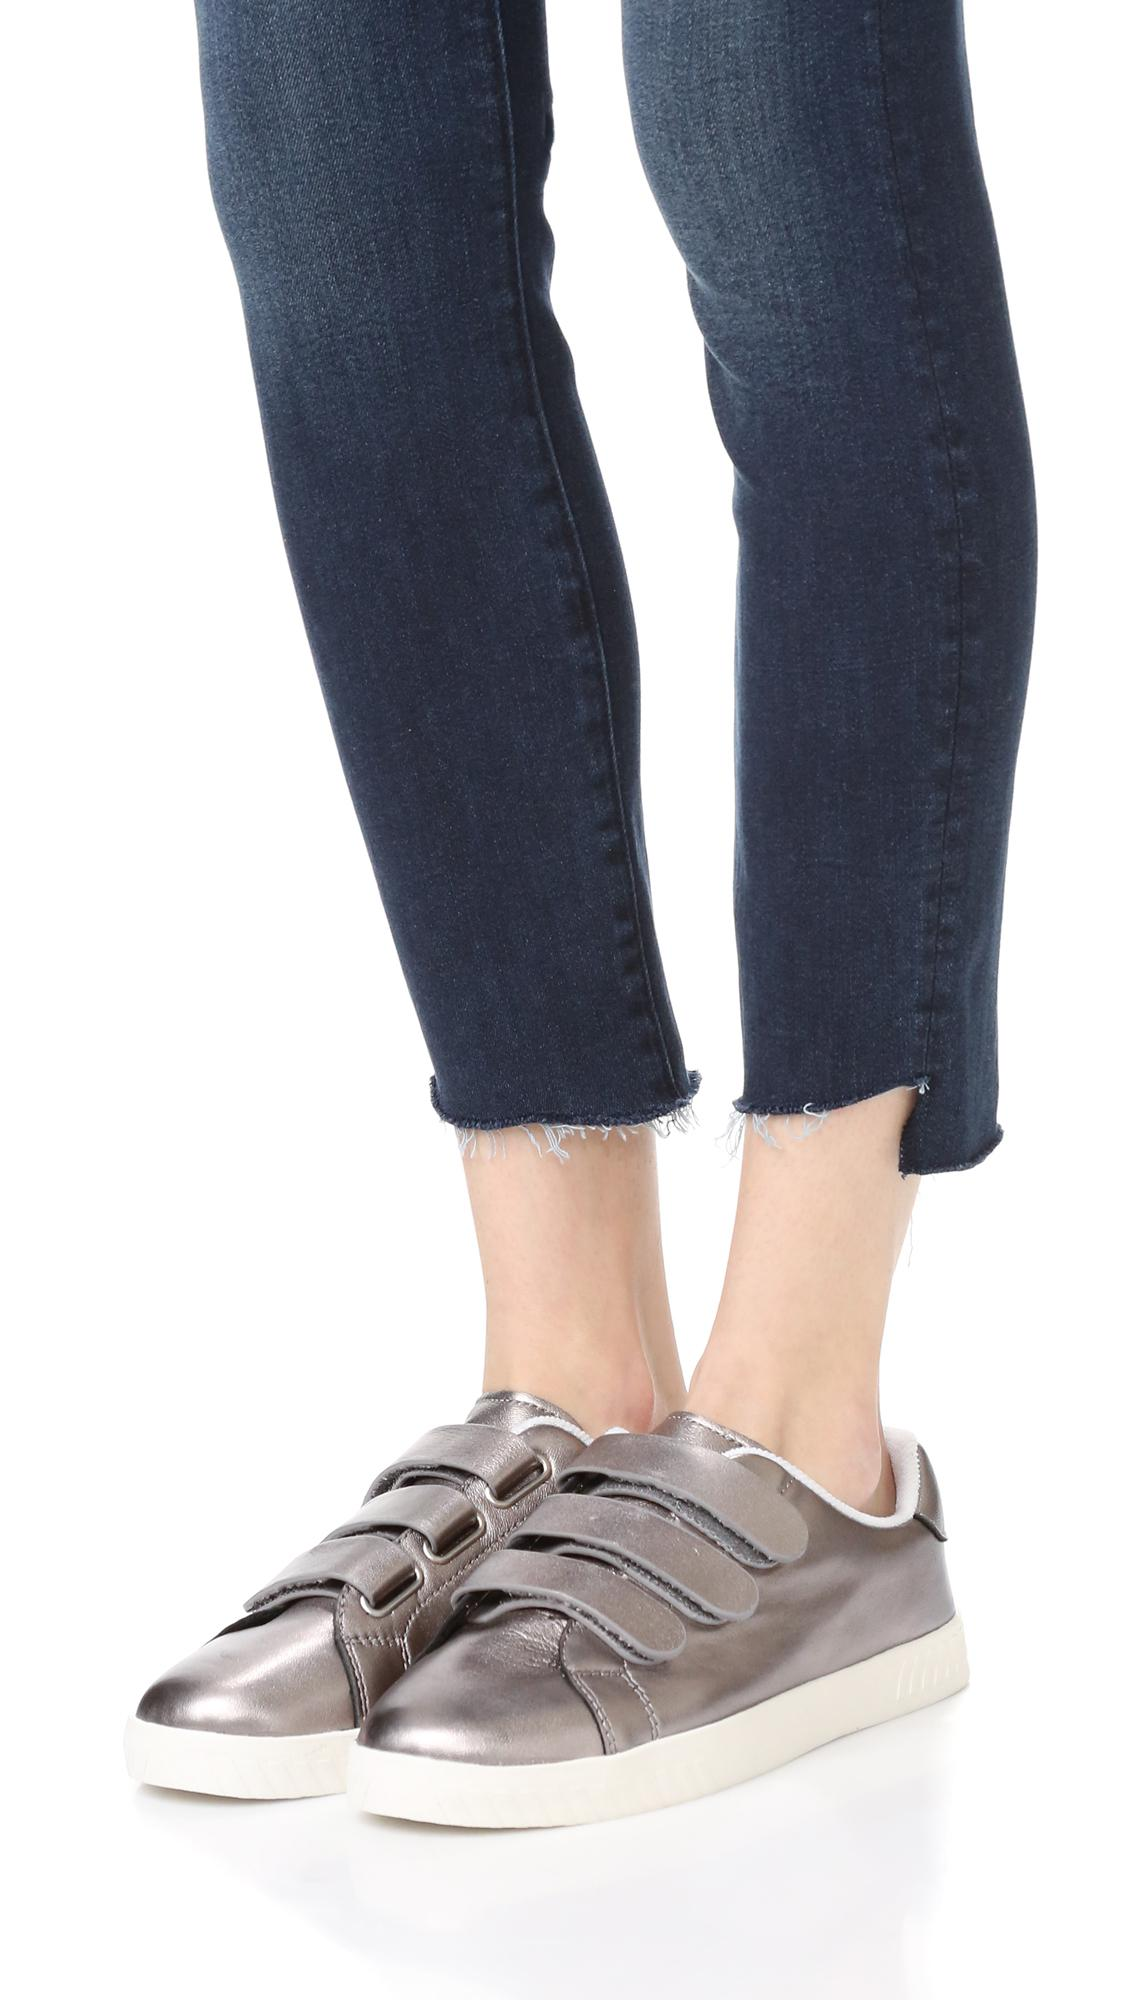 d684c6907dd63 Tretorn Gray Carry Ii Velcro Sneakers